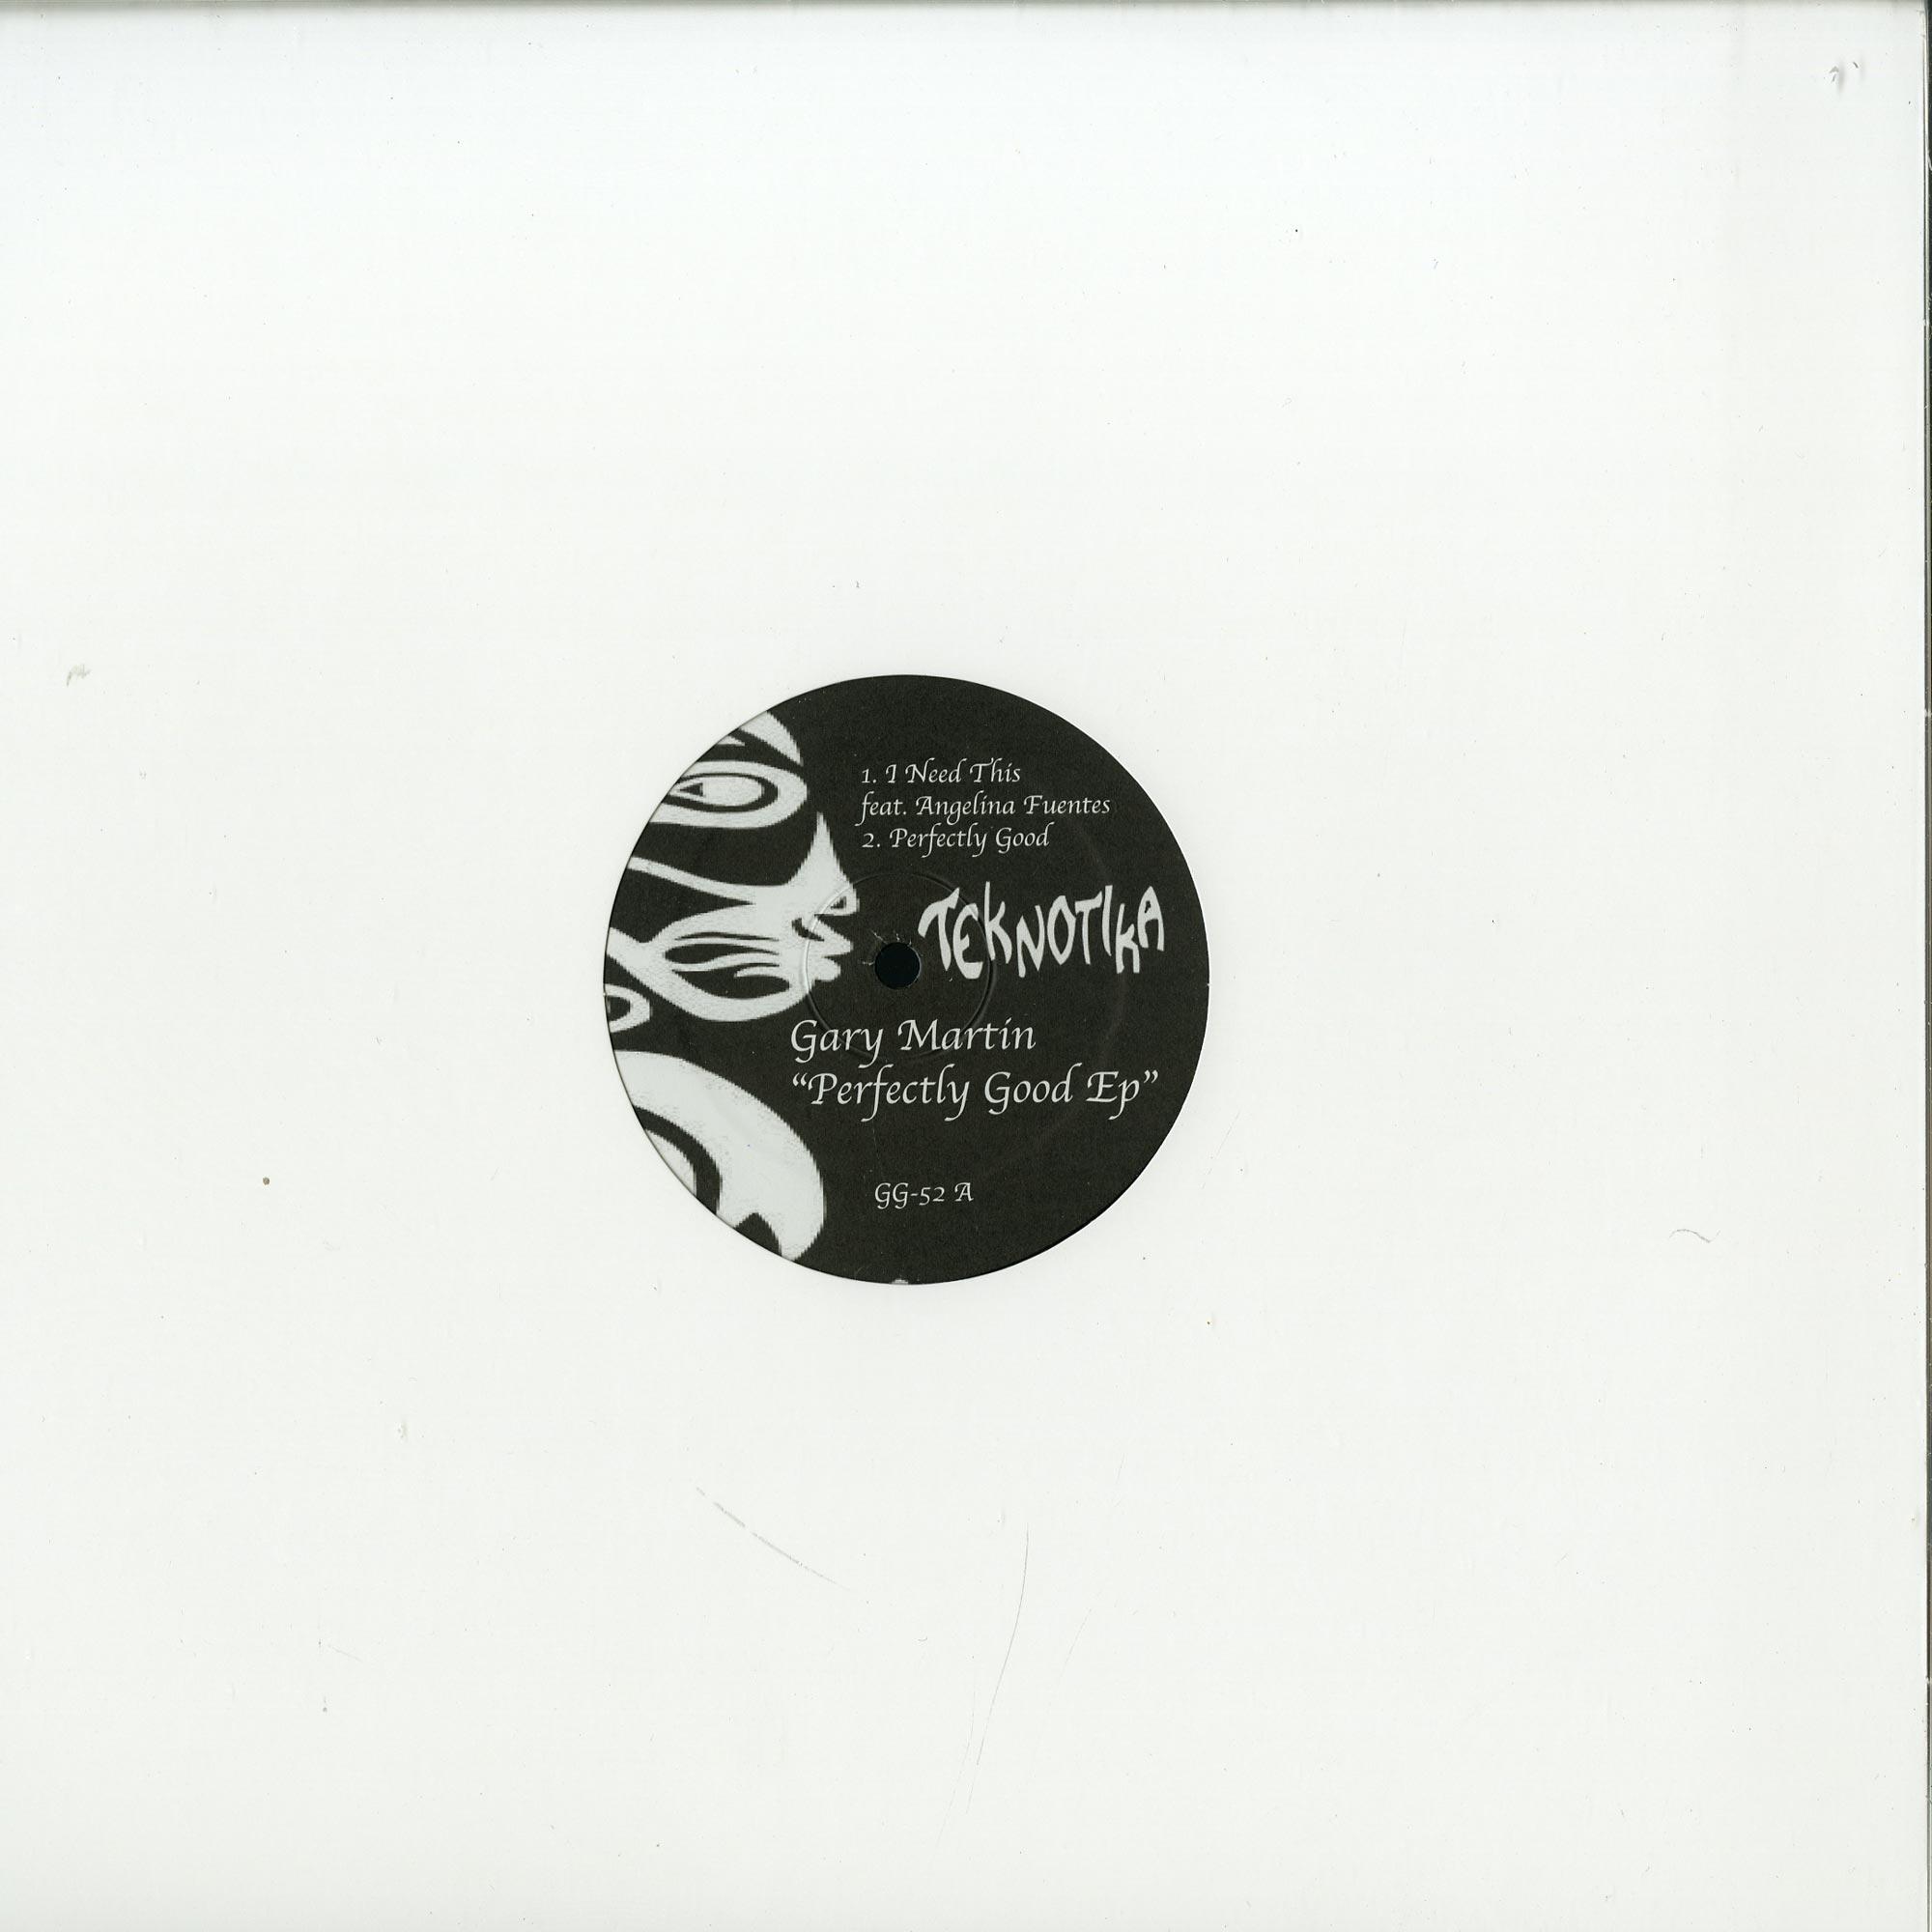 Gary Martin - PERFECTLY GOOD EP